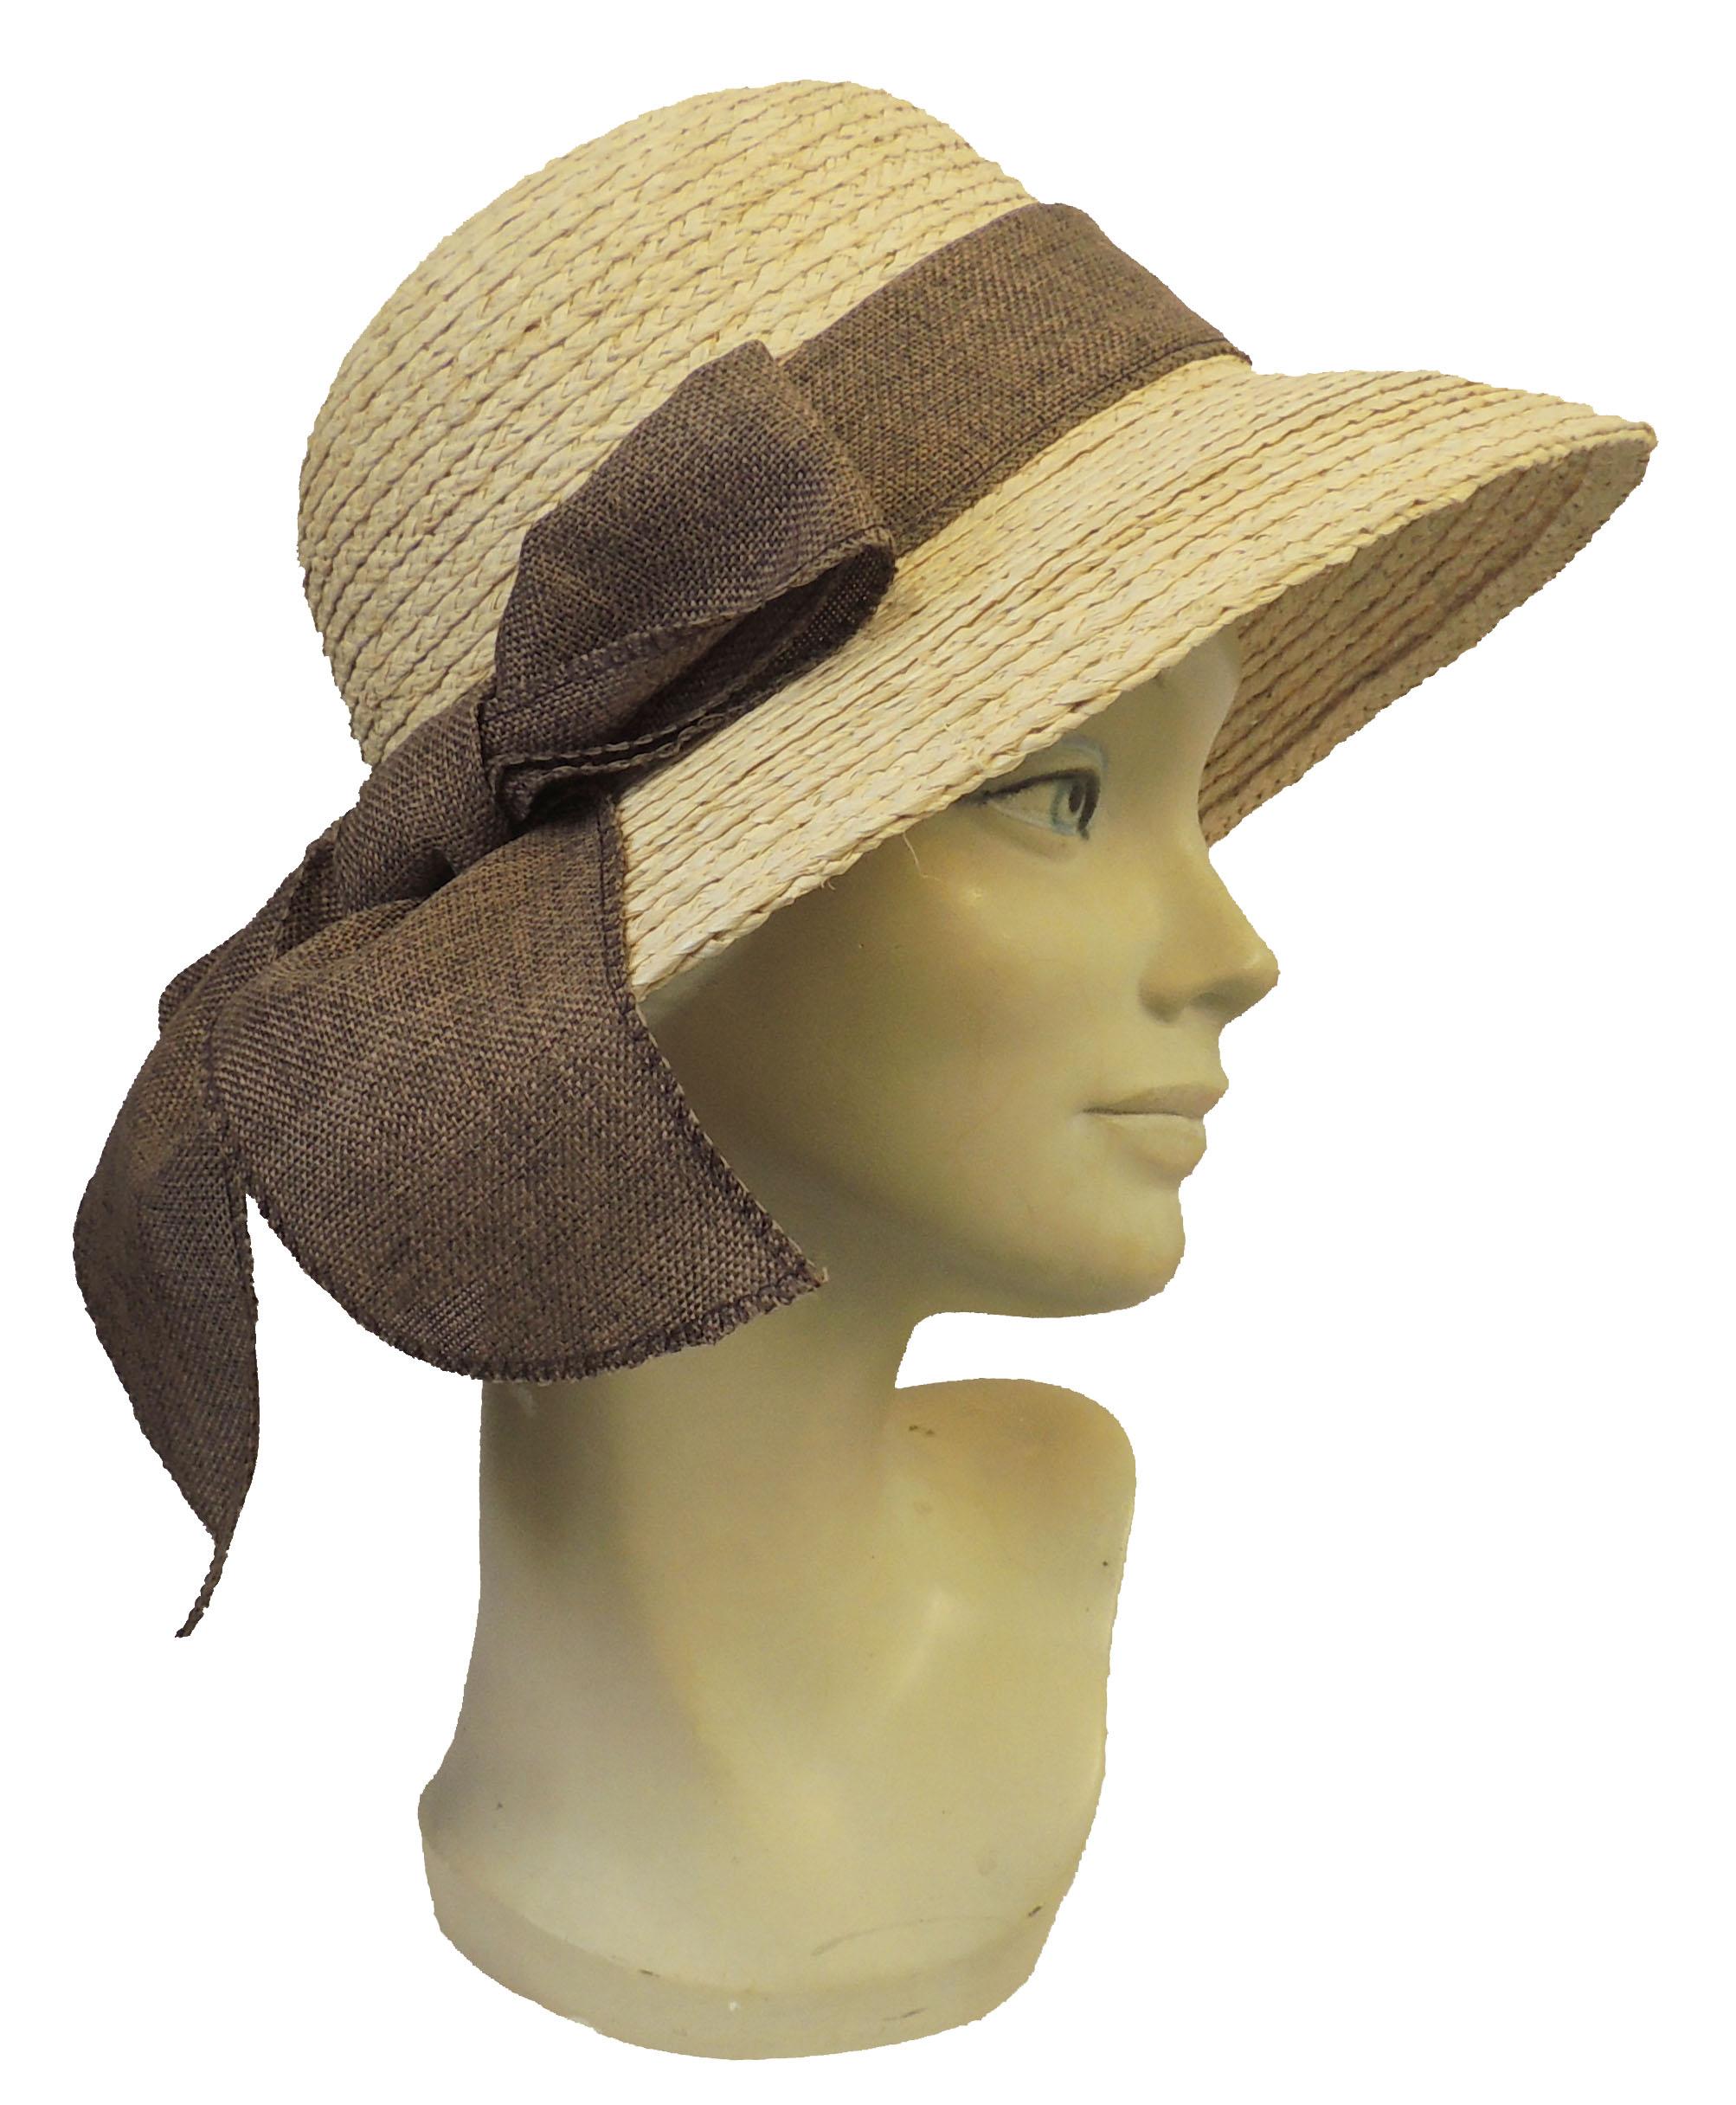 neuf r tro large bord raffia chapeau soleil t ann es 1920 1940s style avec ebay. Black Bedroom Furniture Sets. Home Design Ideas